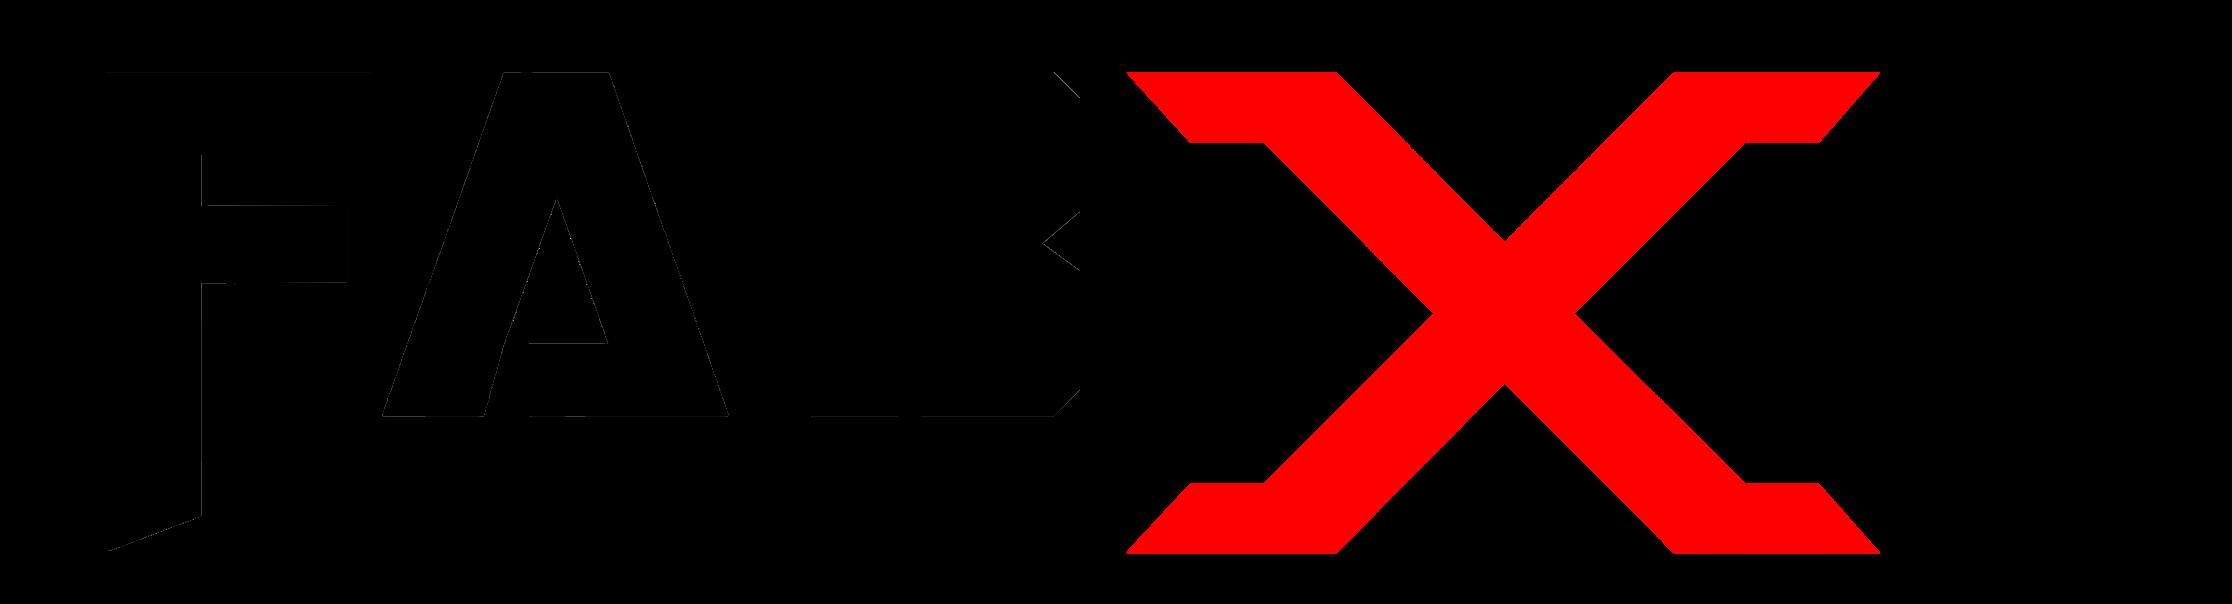 FabX logo